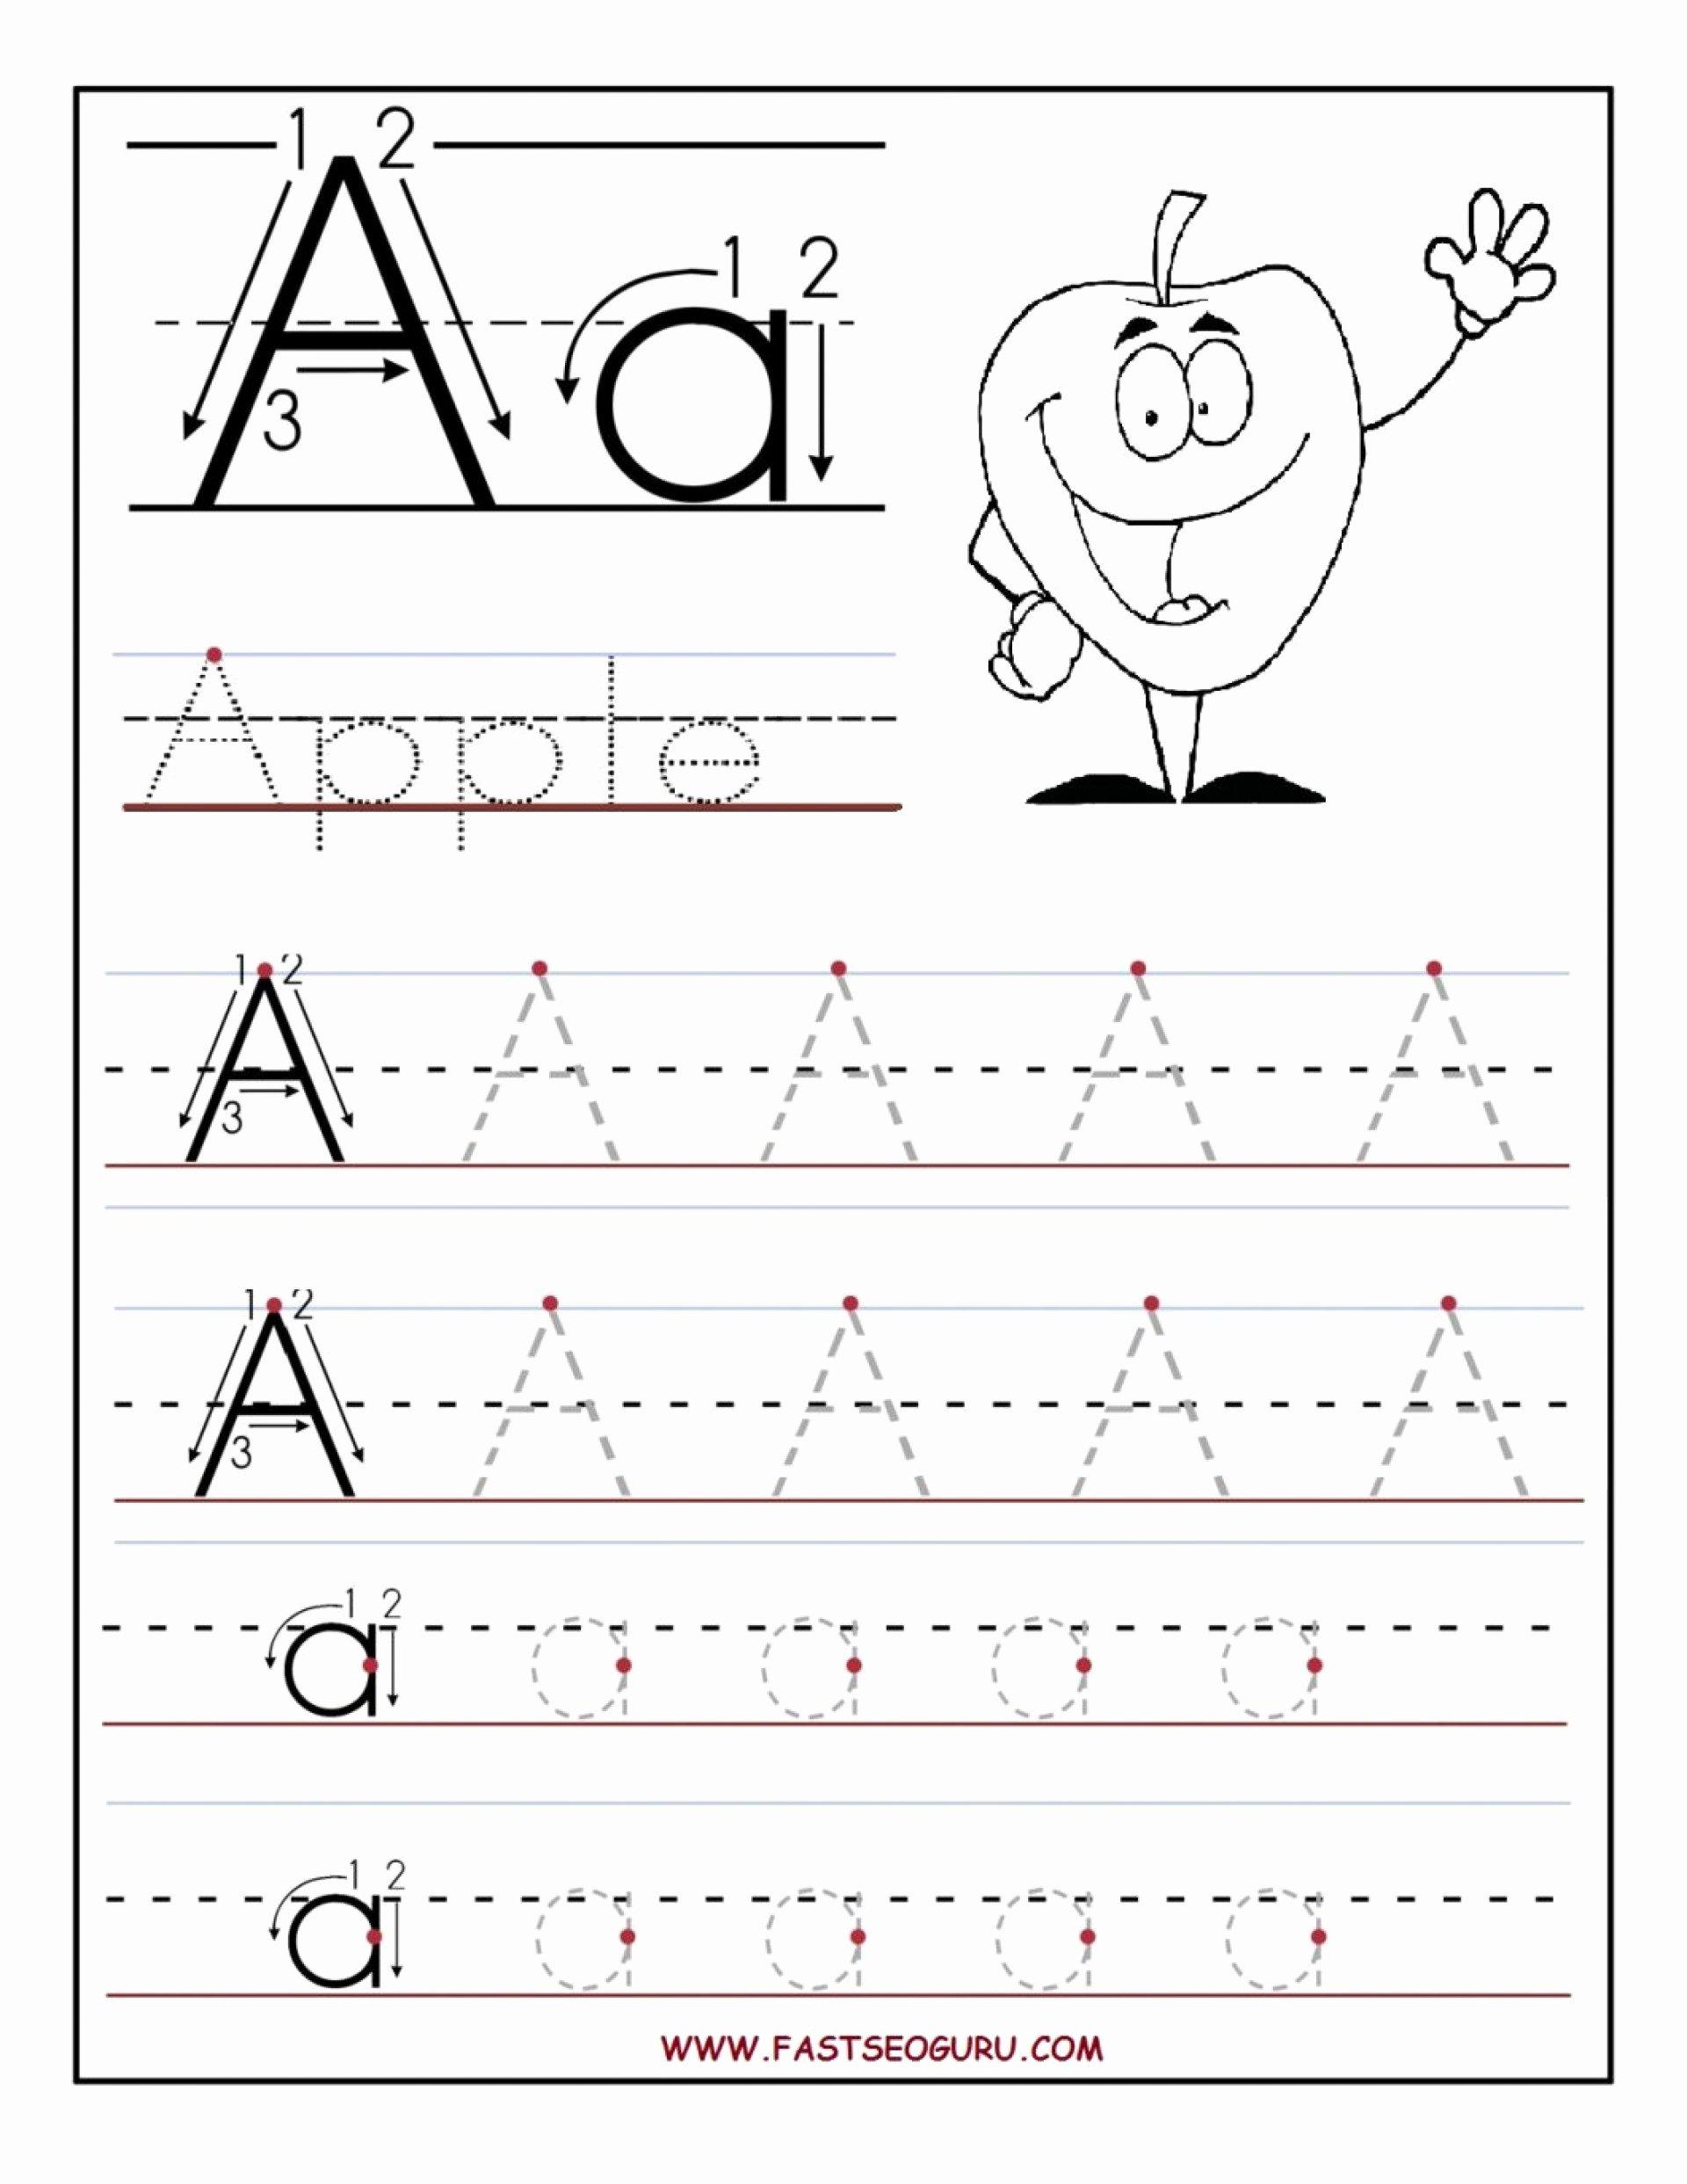 Free Printable Worksheets for Preschoolers Alphabets top Coloring Book Preschool Free Printable Worksheets Tracing